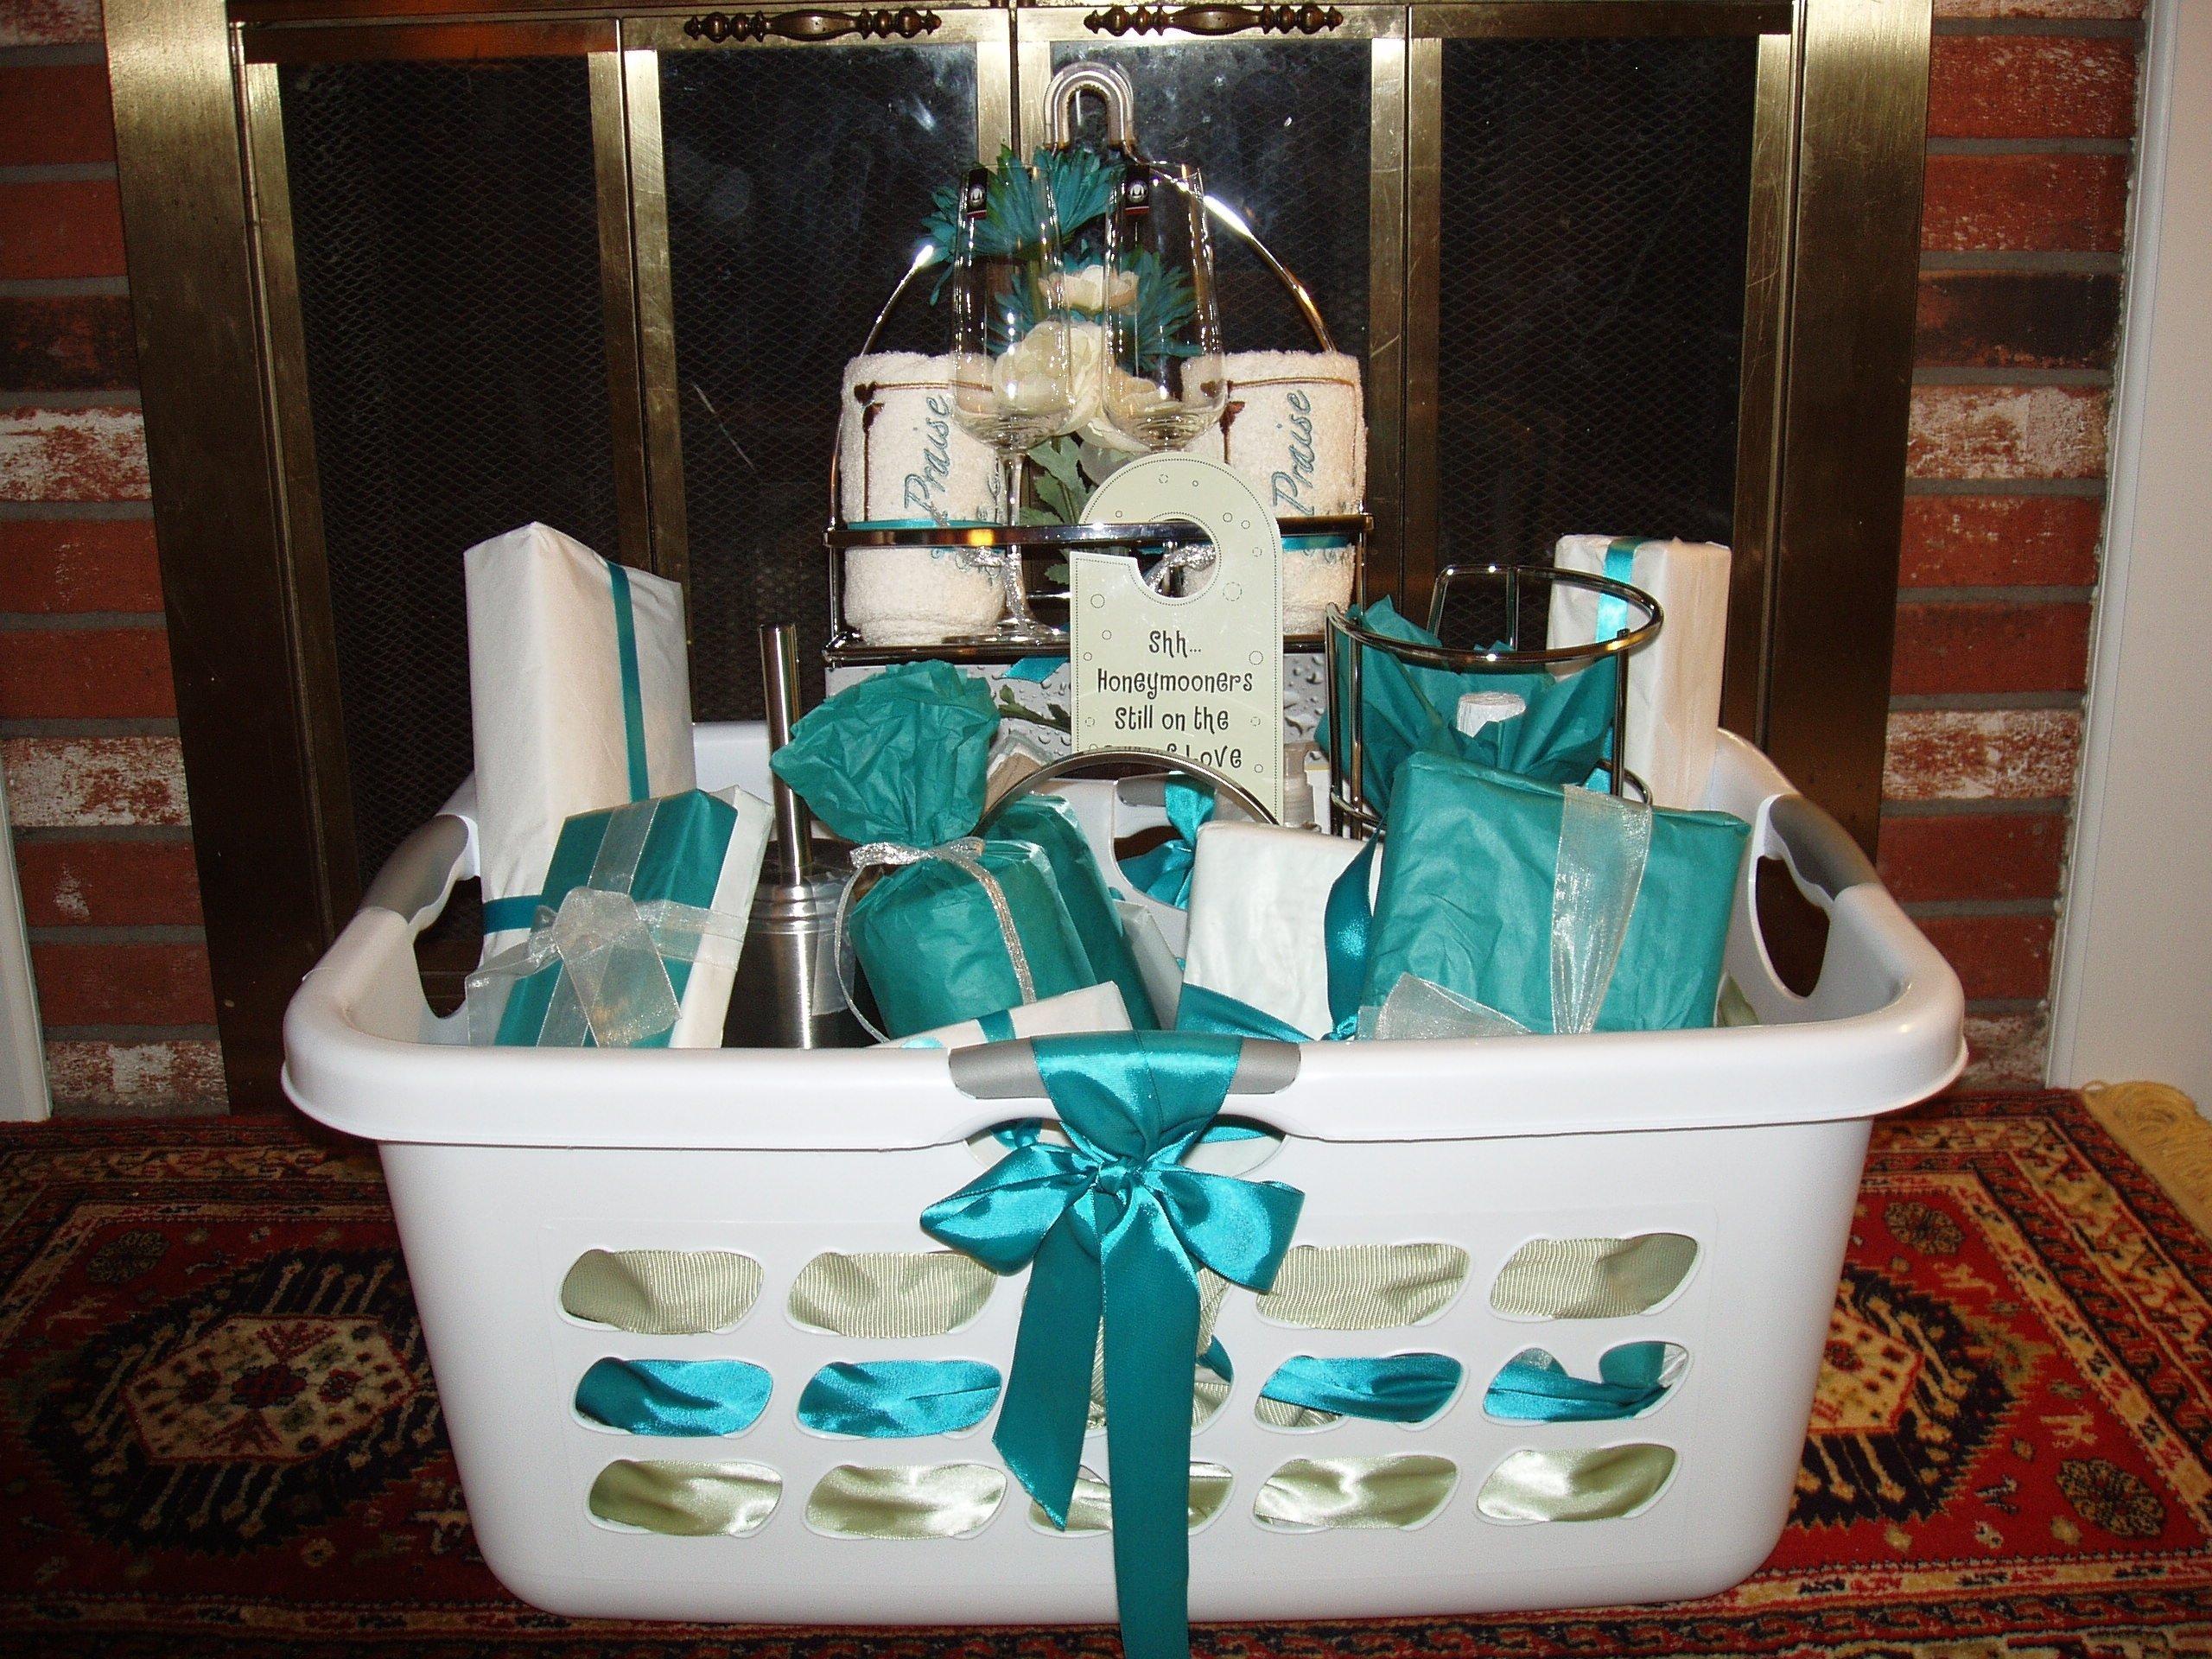 10 Most Popular Homemade Bridal Shower Gift Ideas homemade gift ideas for bridal shower fresh wedding shower t ideas 2020